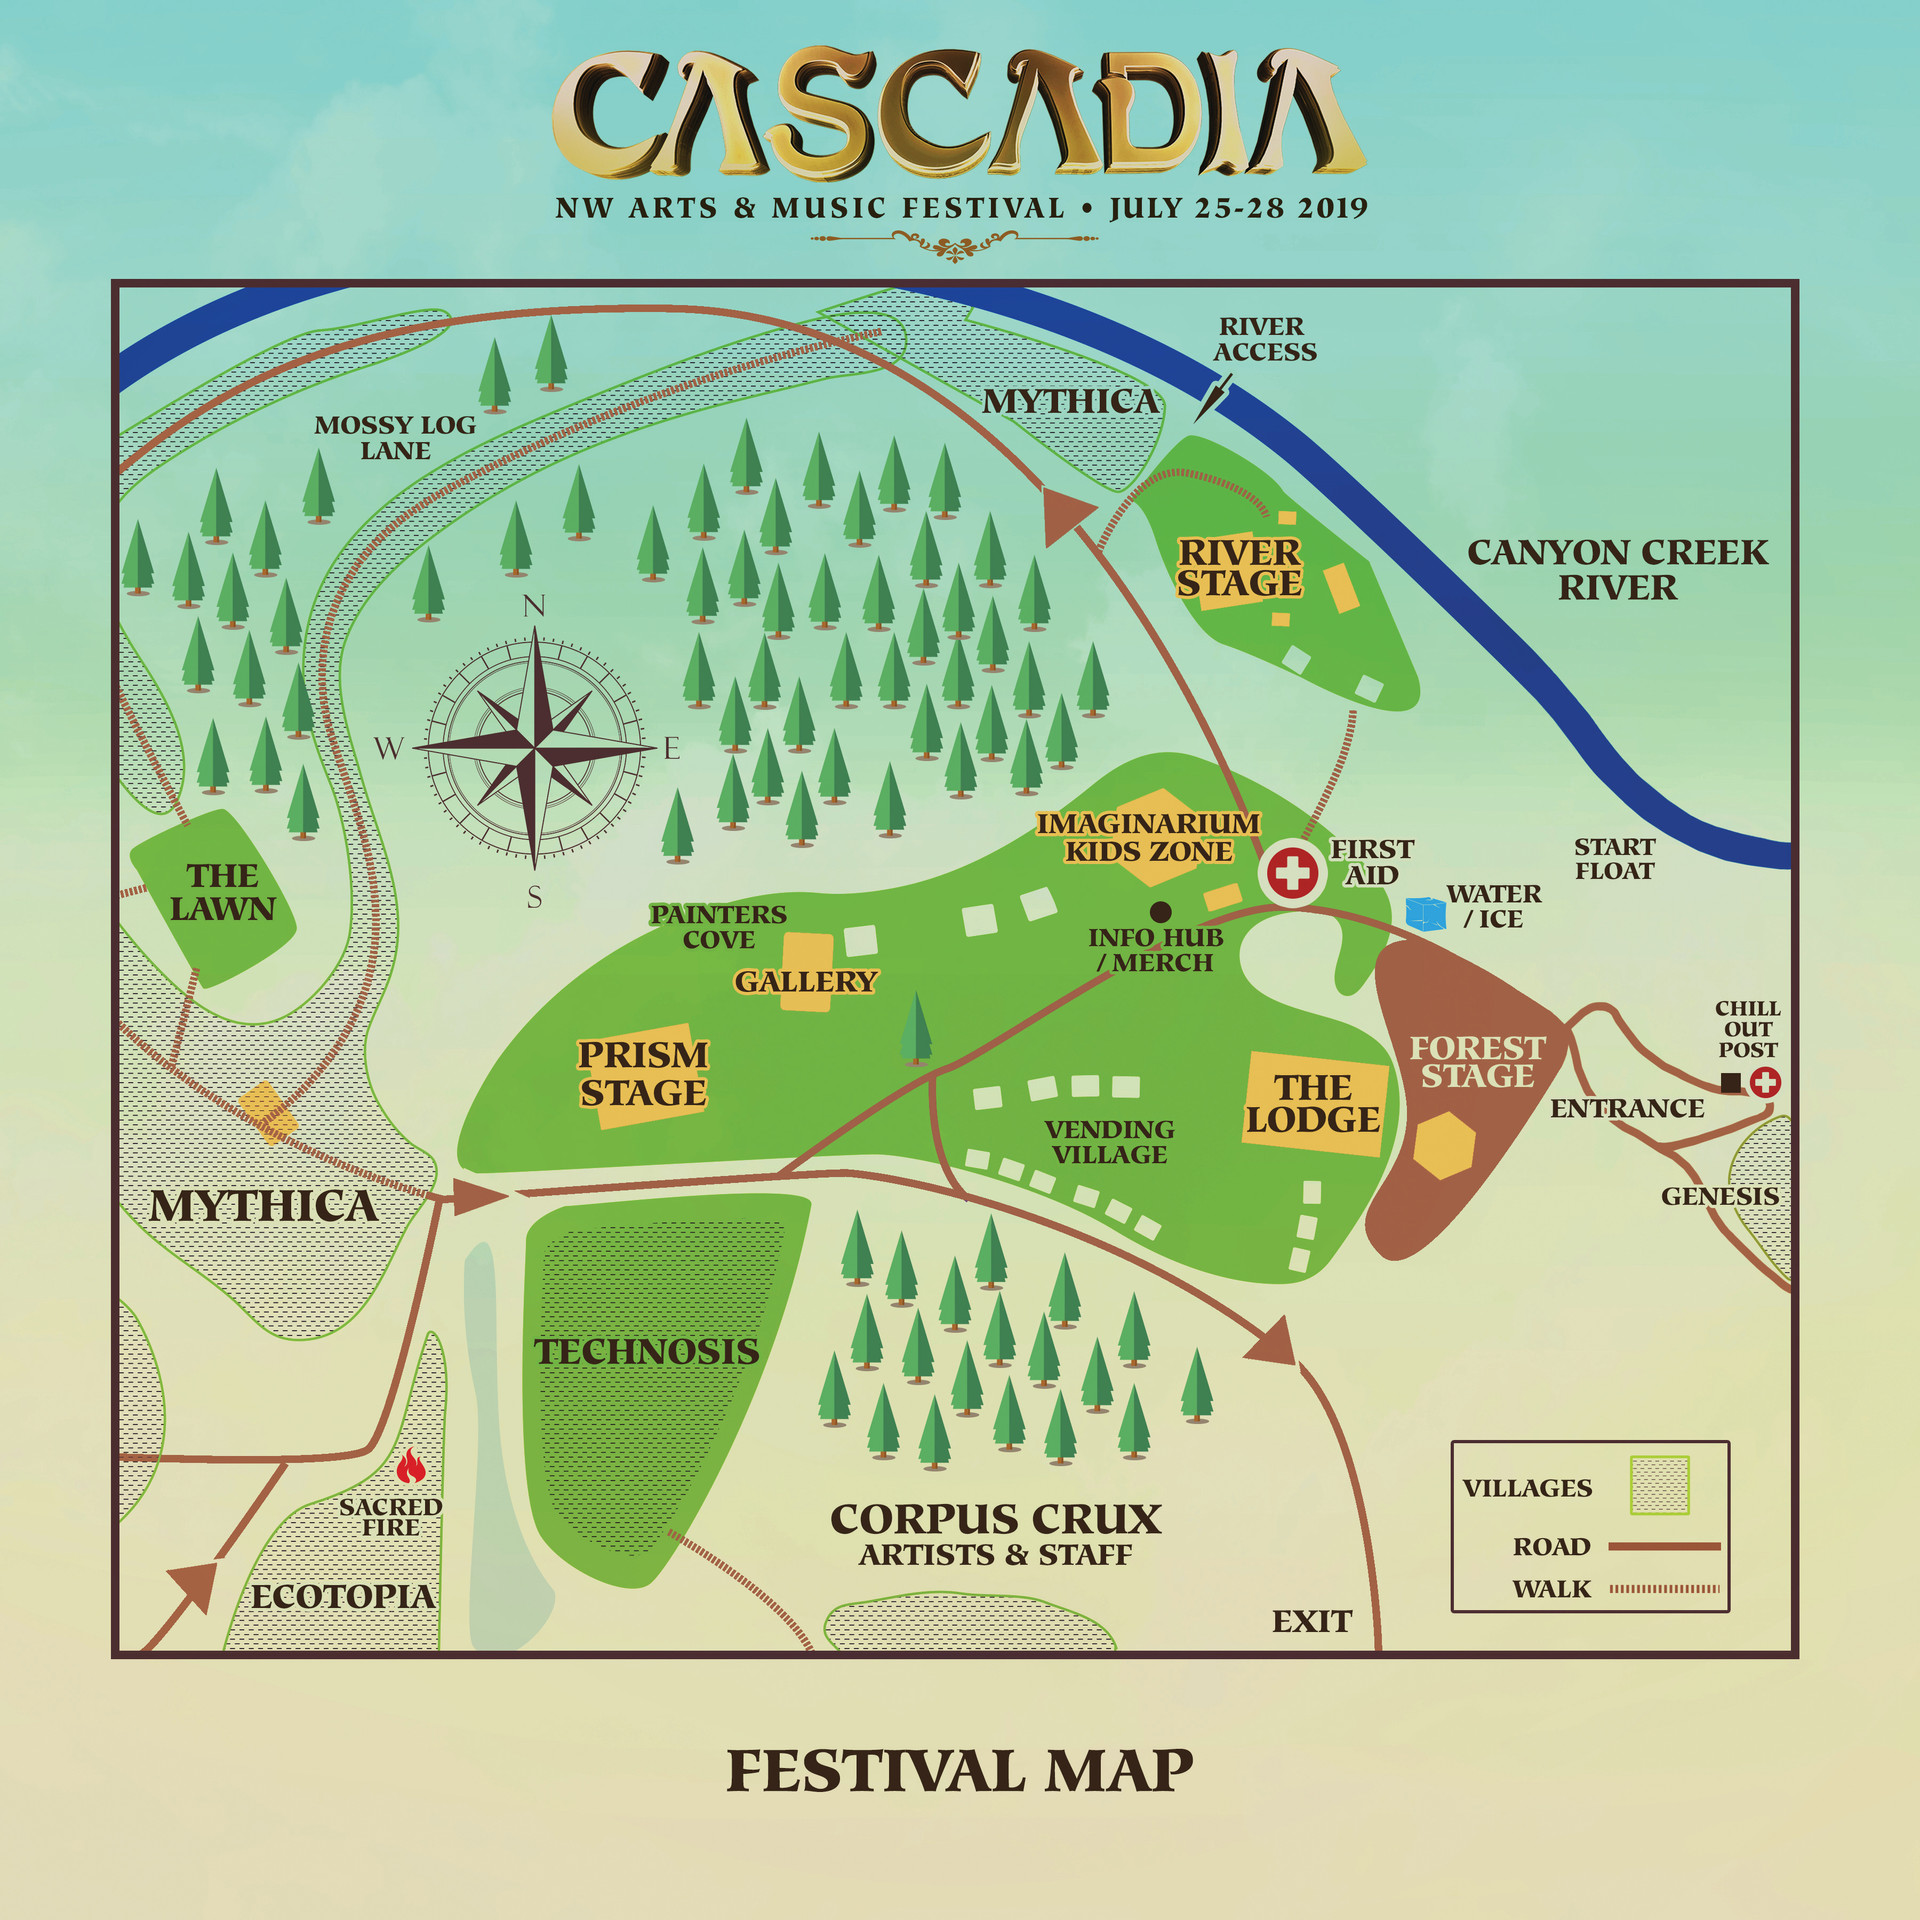 Cascadia2019_Map_12x12_Print.jpg